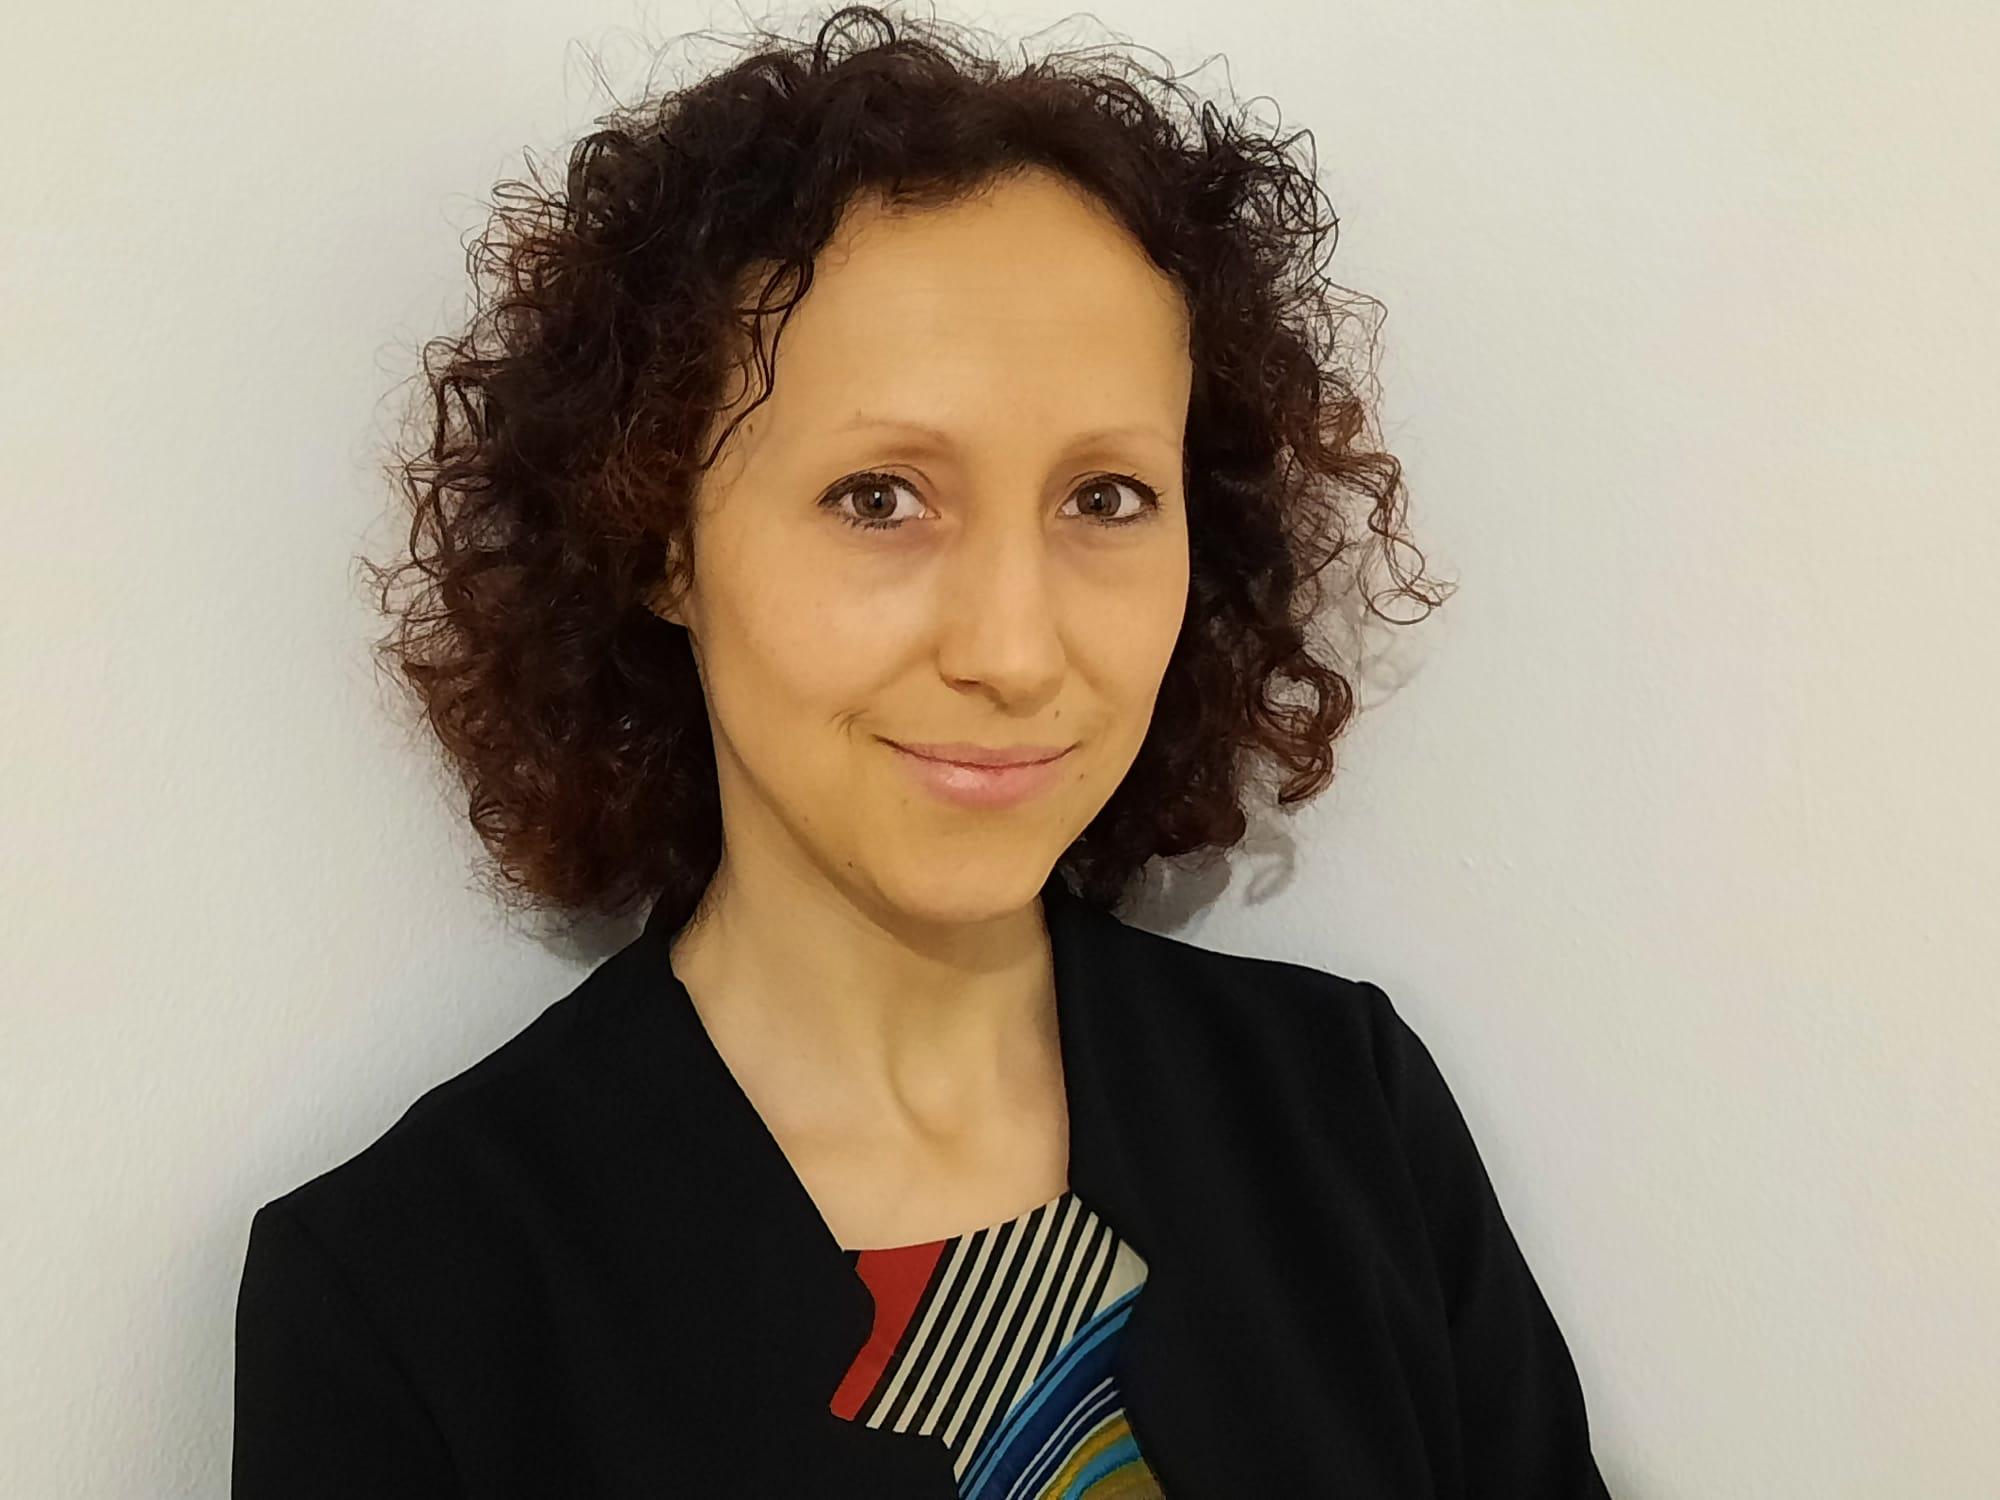 Serena Bonomi